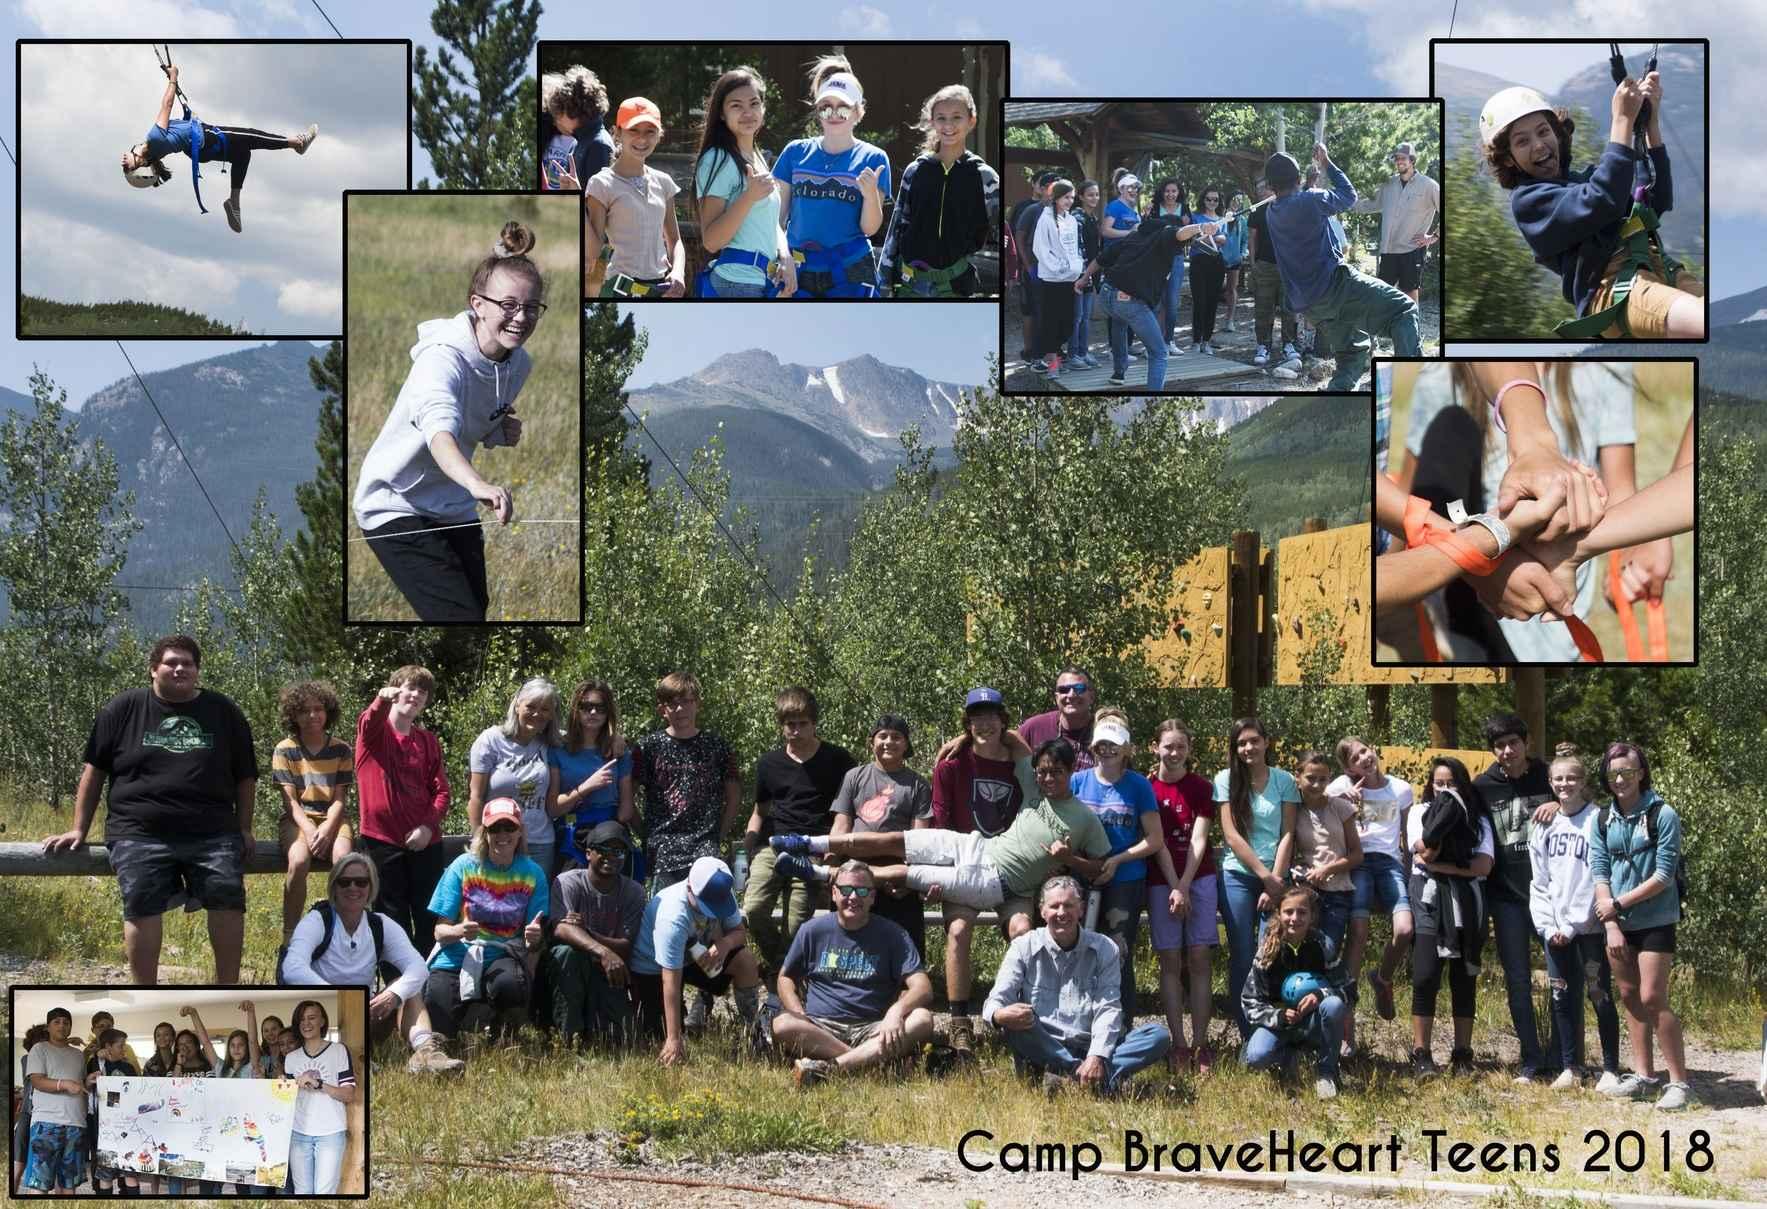 Camp BraveHeart Teens image